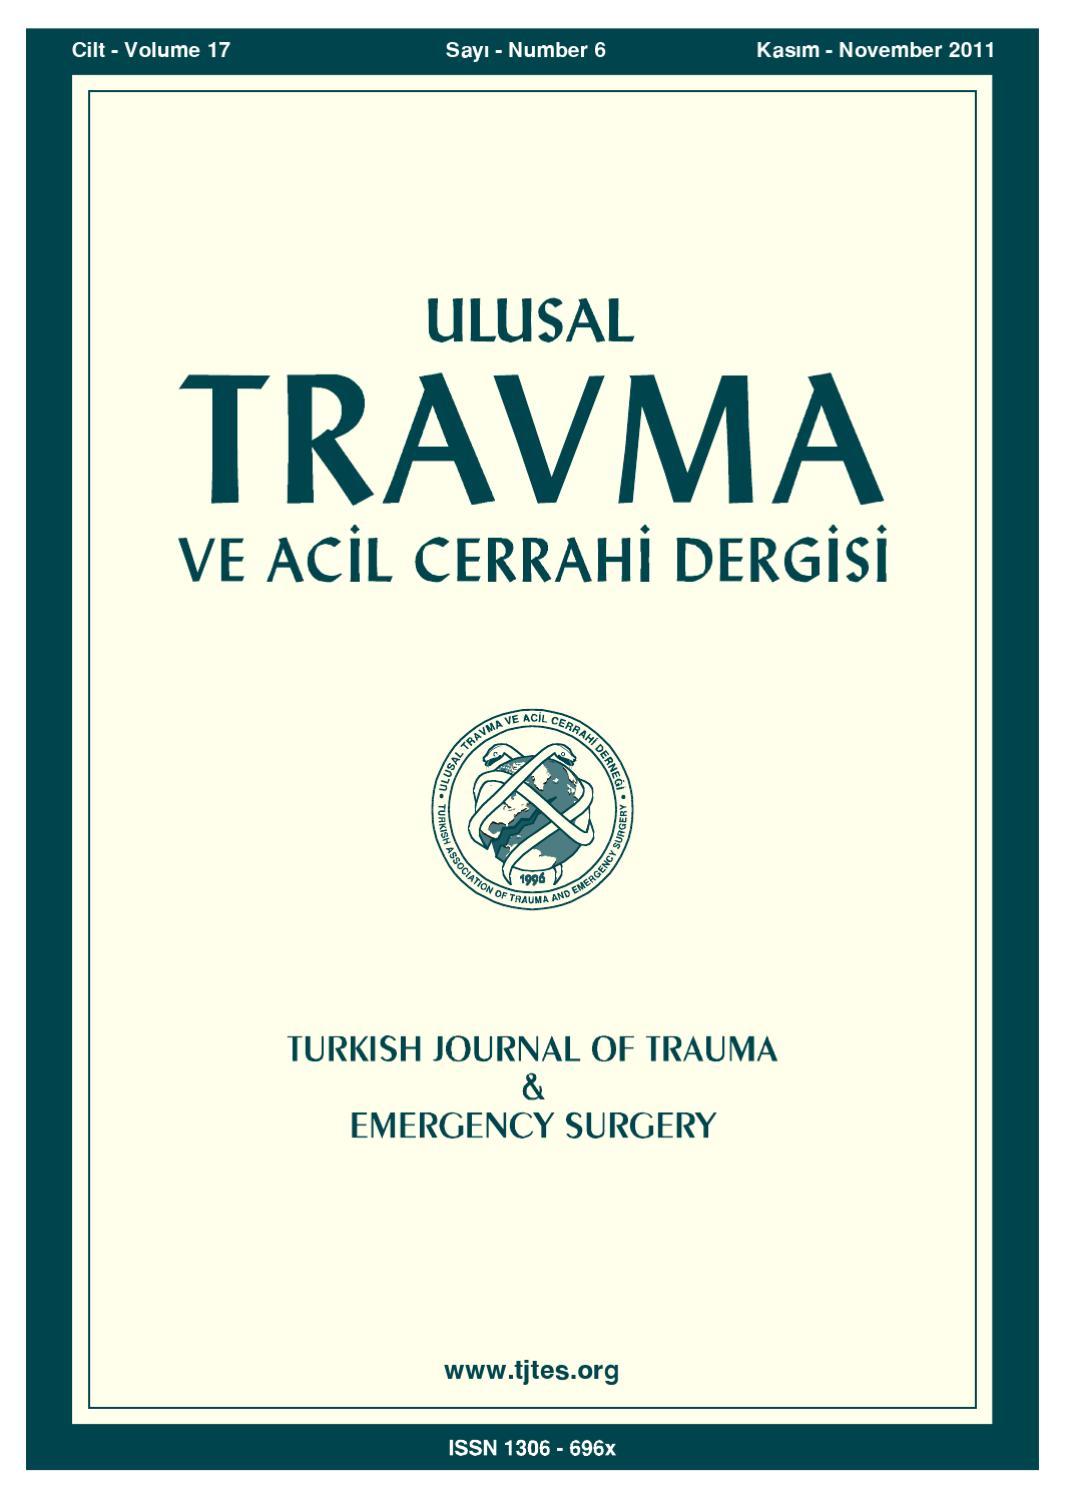 Travma 2011 6 By Karepublishing Issuu